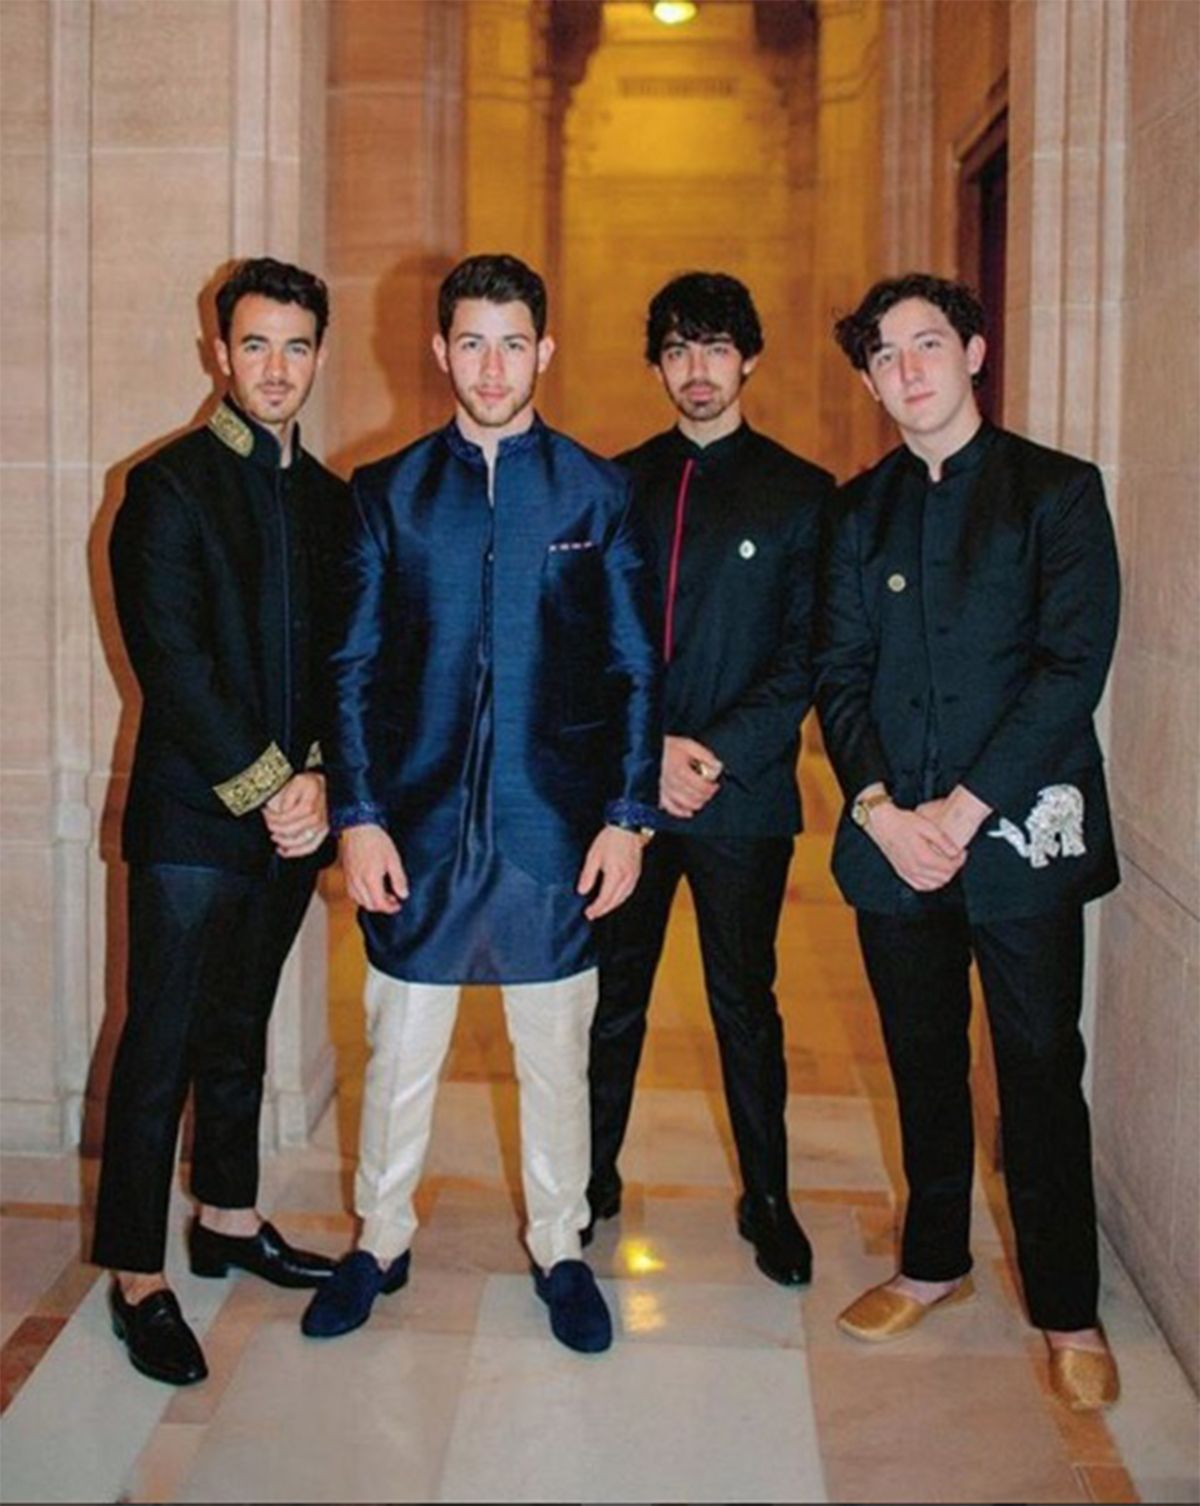 Boda de Nick Jonas y Priyanka Chopra